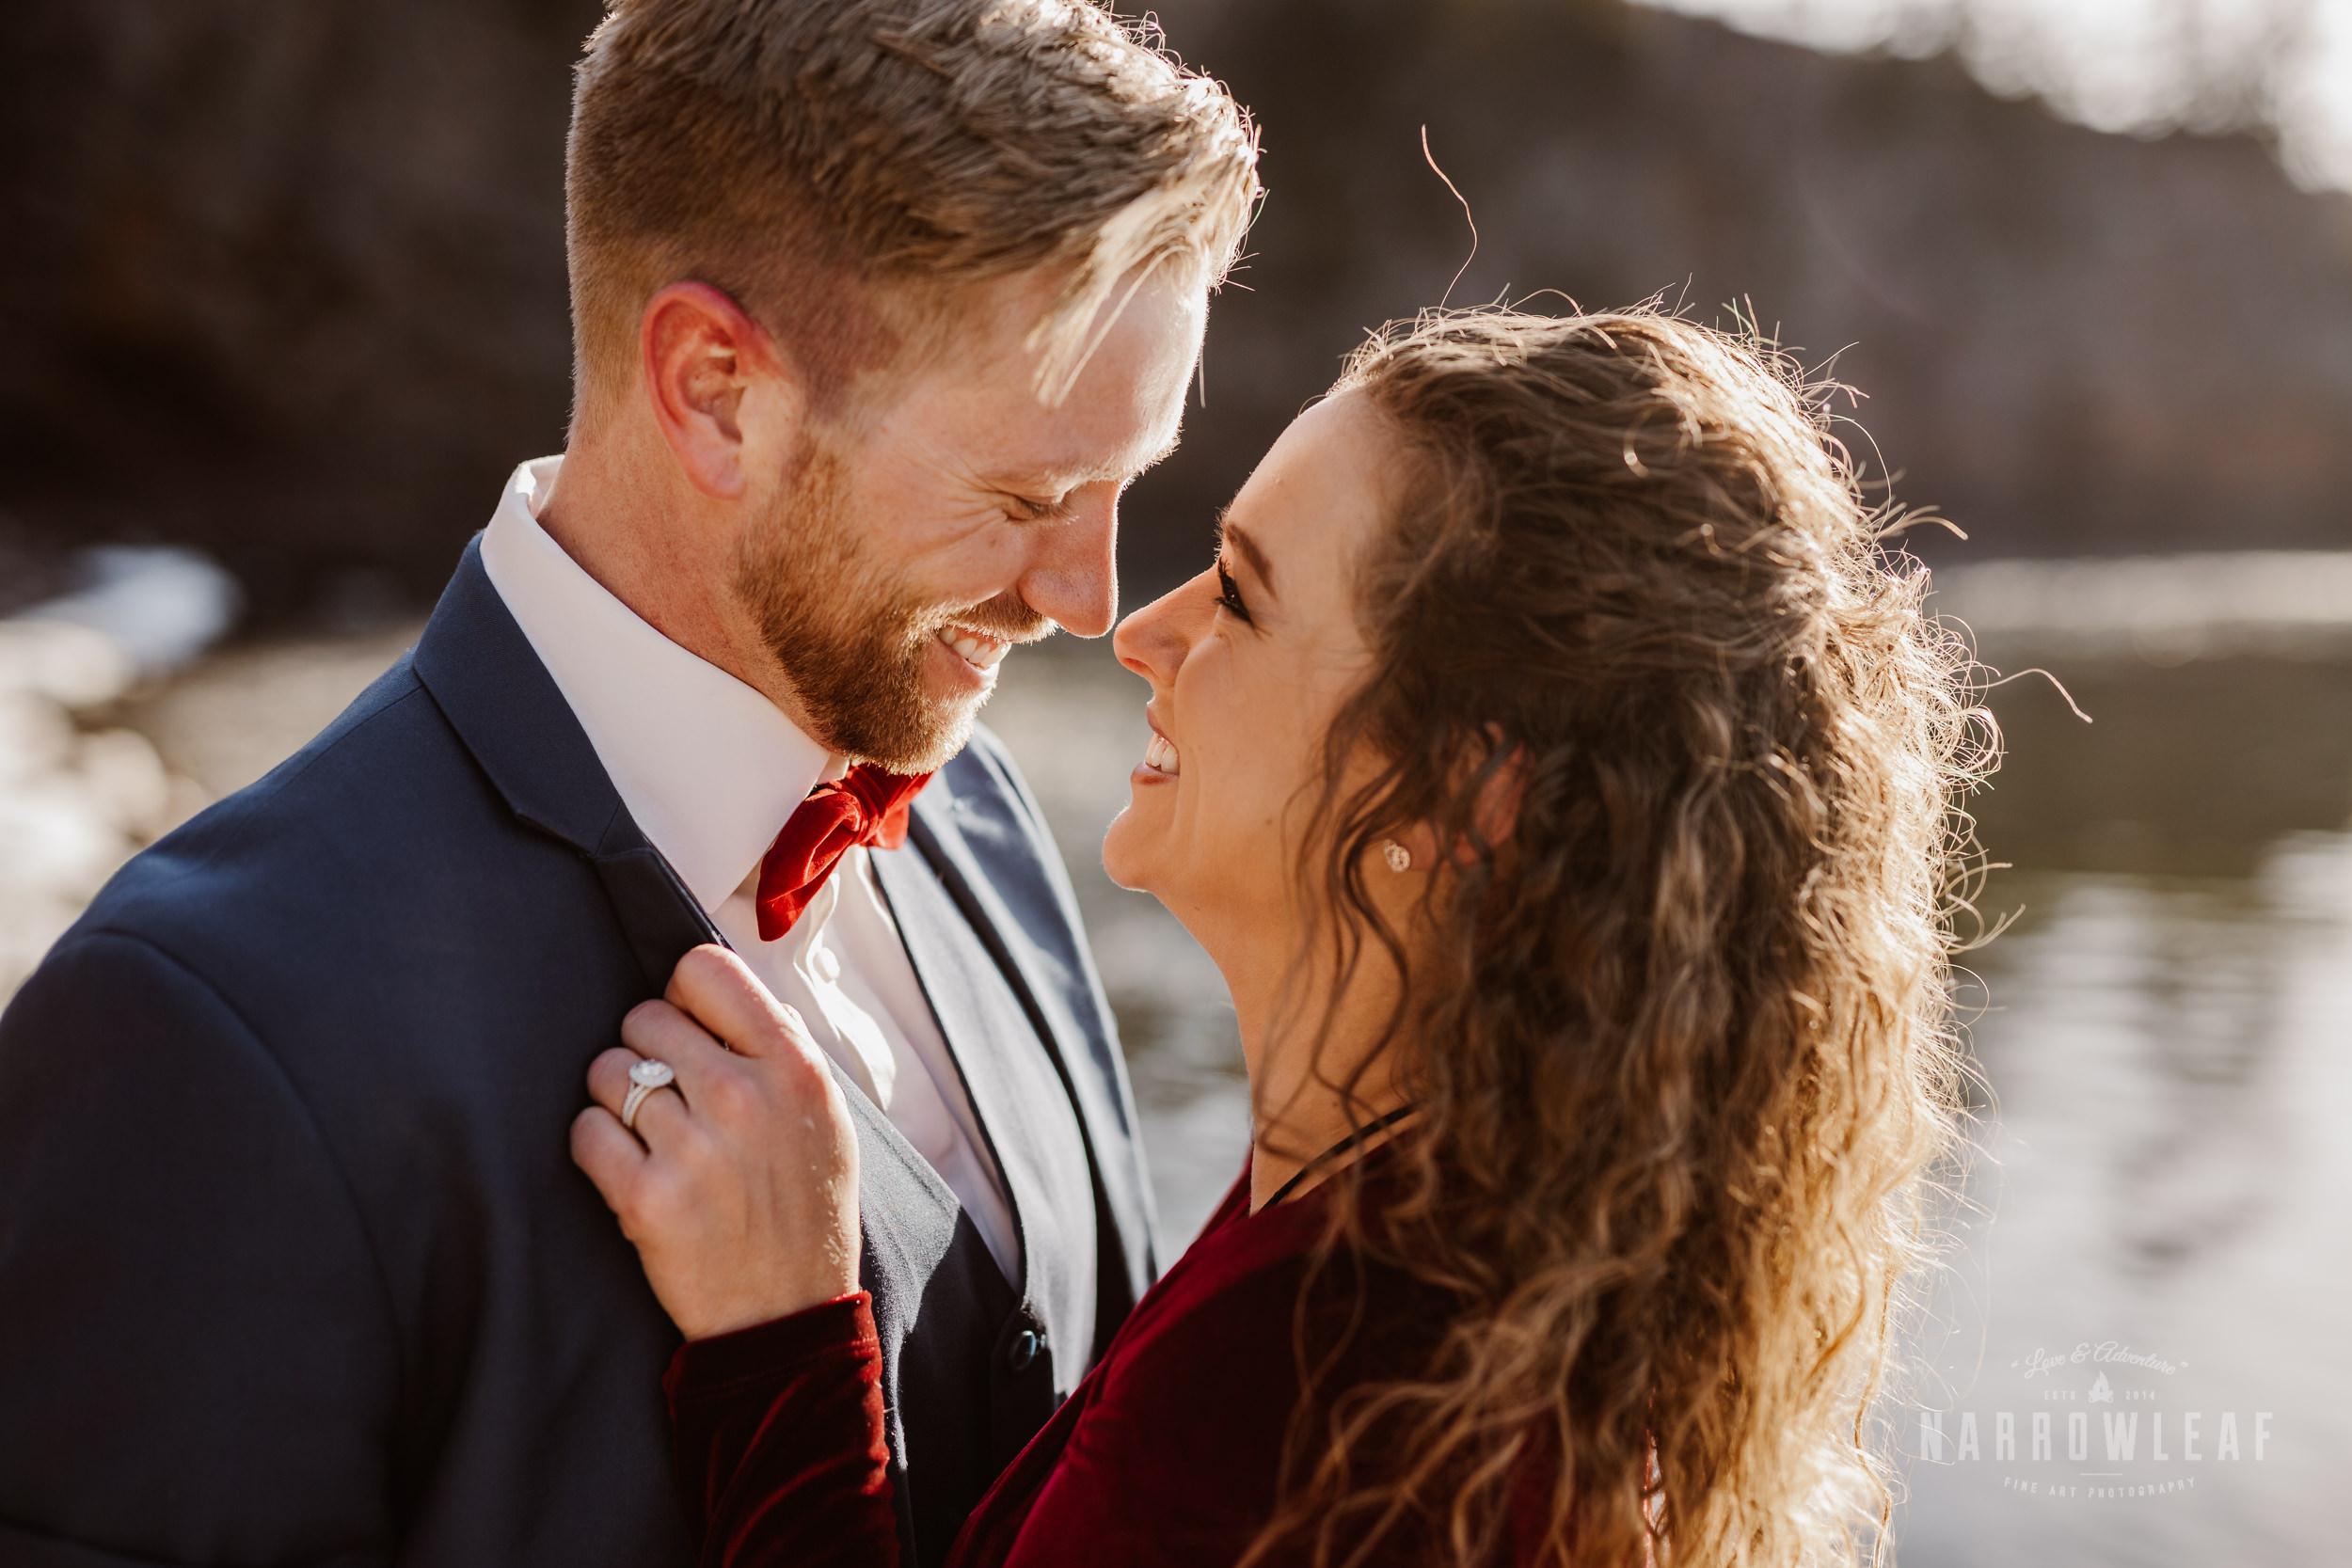 minnesota-adventure-elopement-Narrowleaf_Love_and_Adventure_Photography-9147.jpg